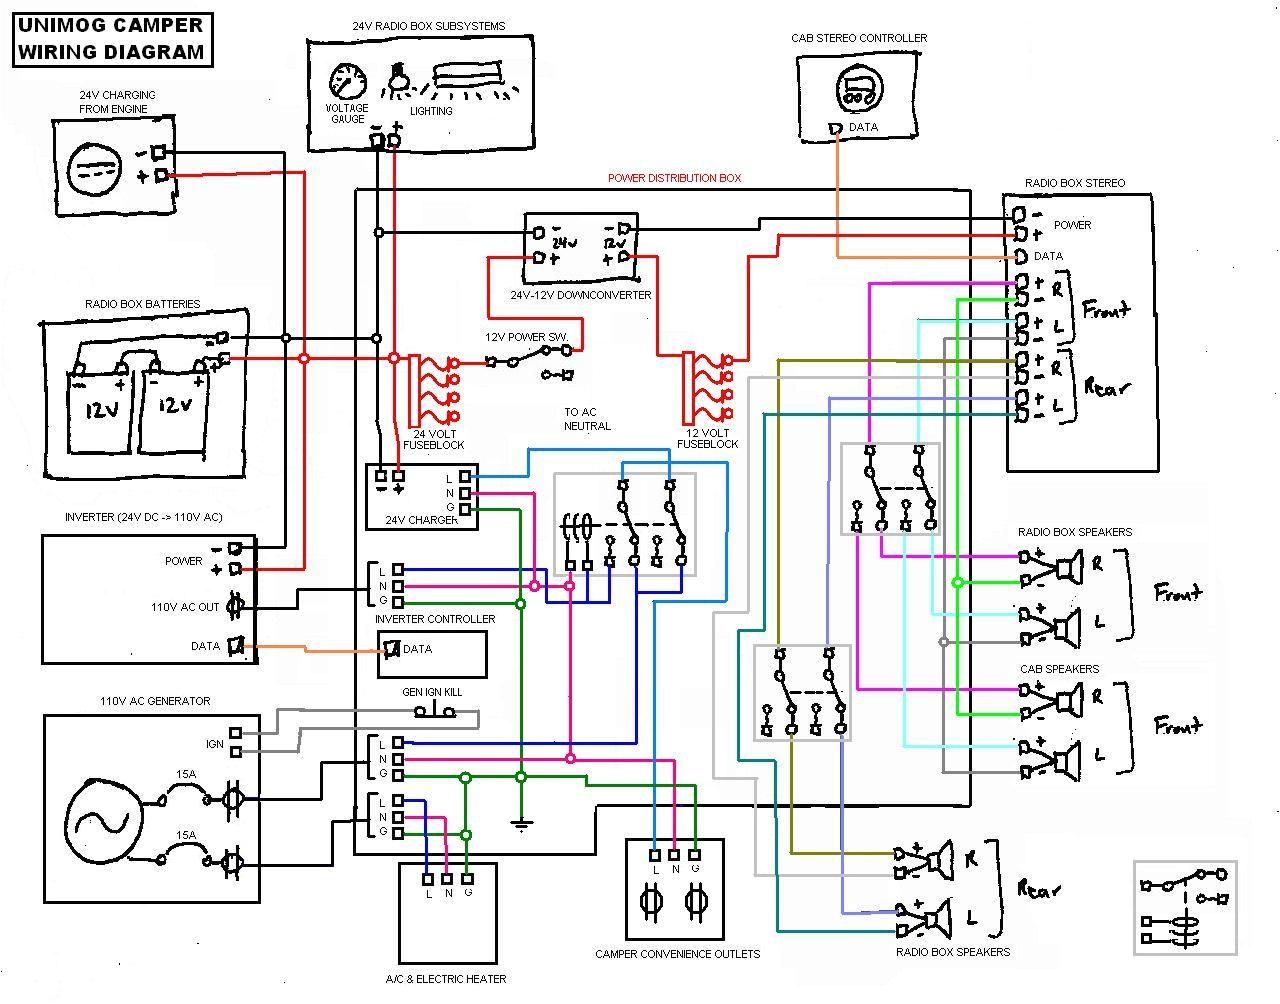 camper trailer ke wiring diagrams simple electronic circuits